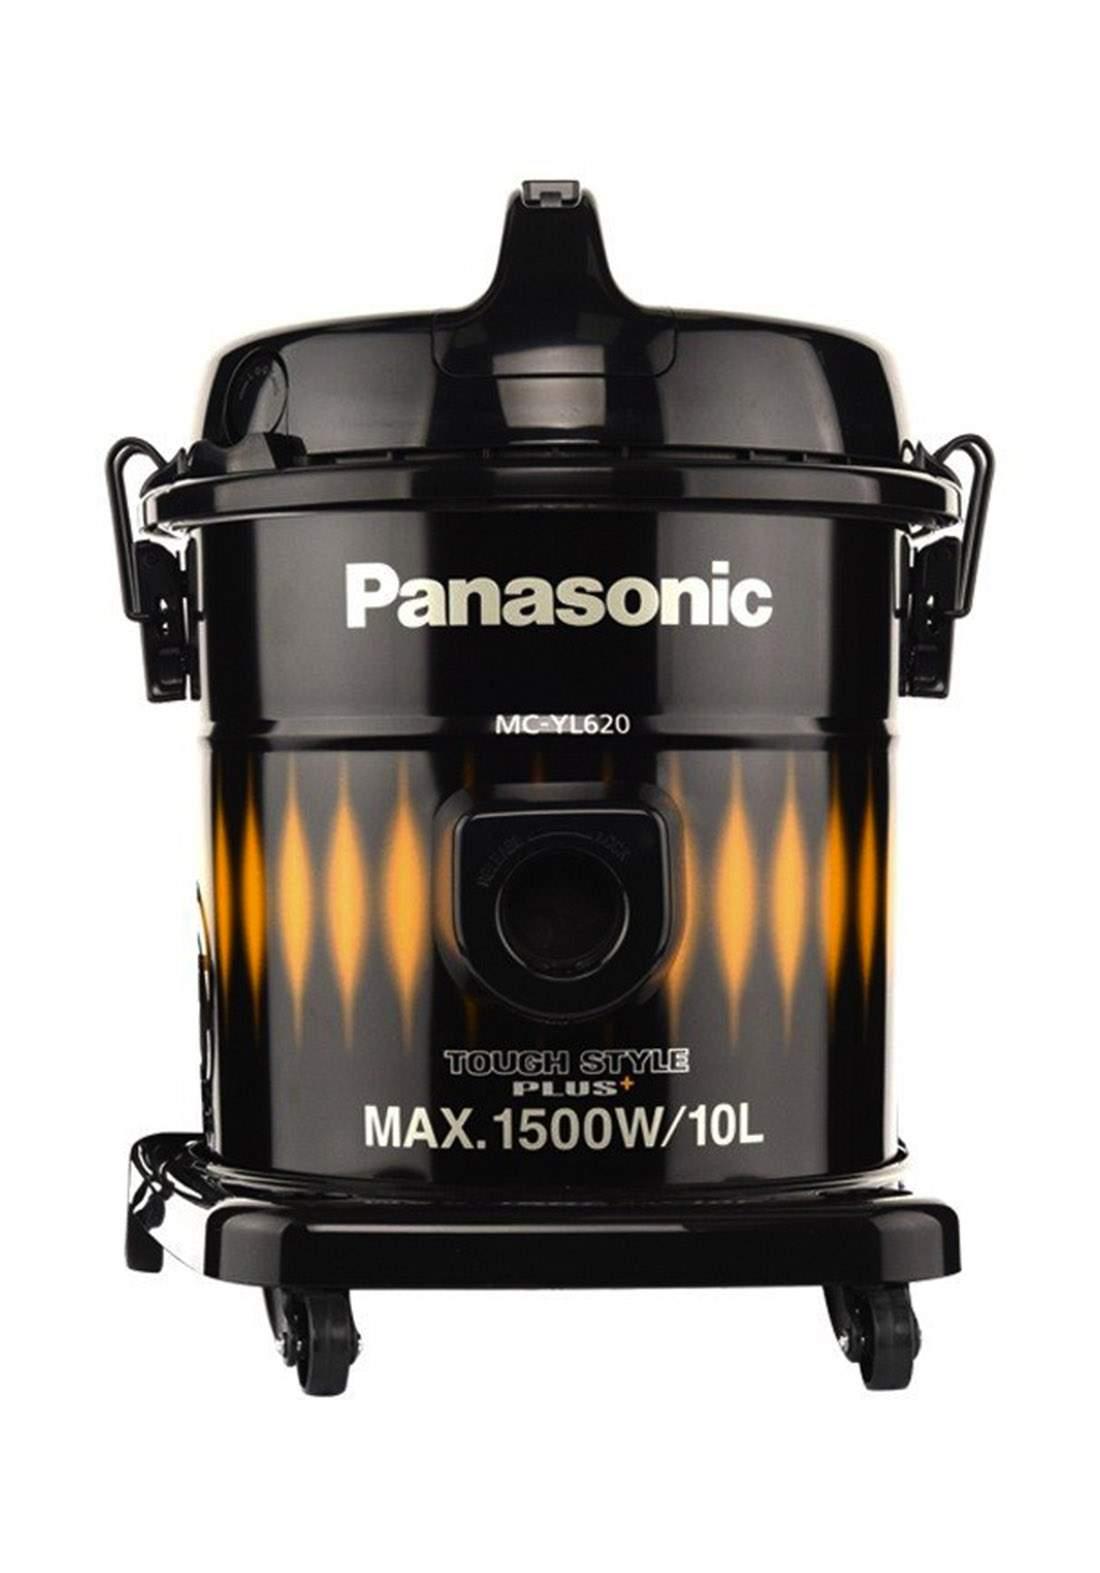 Panasonic (MC-YL620YH49) 10 Liters 1500w Vacum Cleaner مكنسة كهربائية